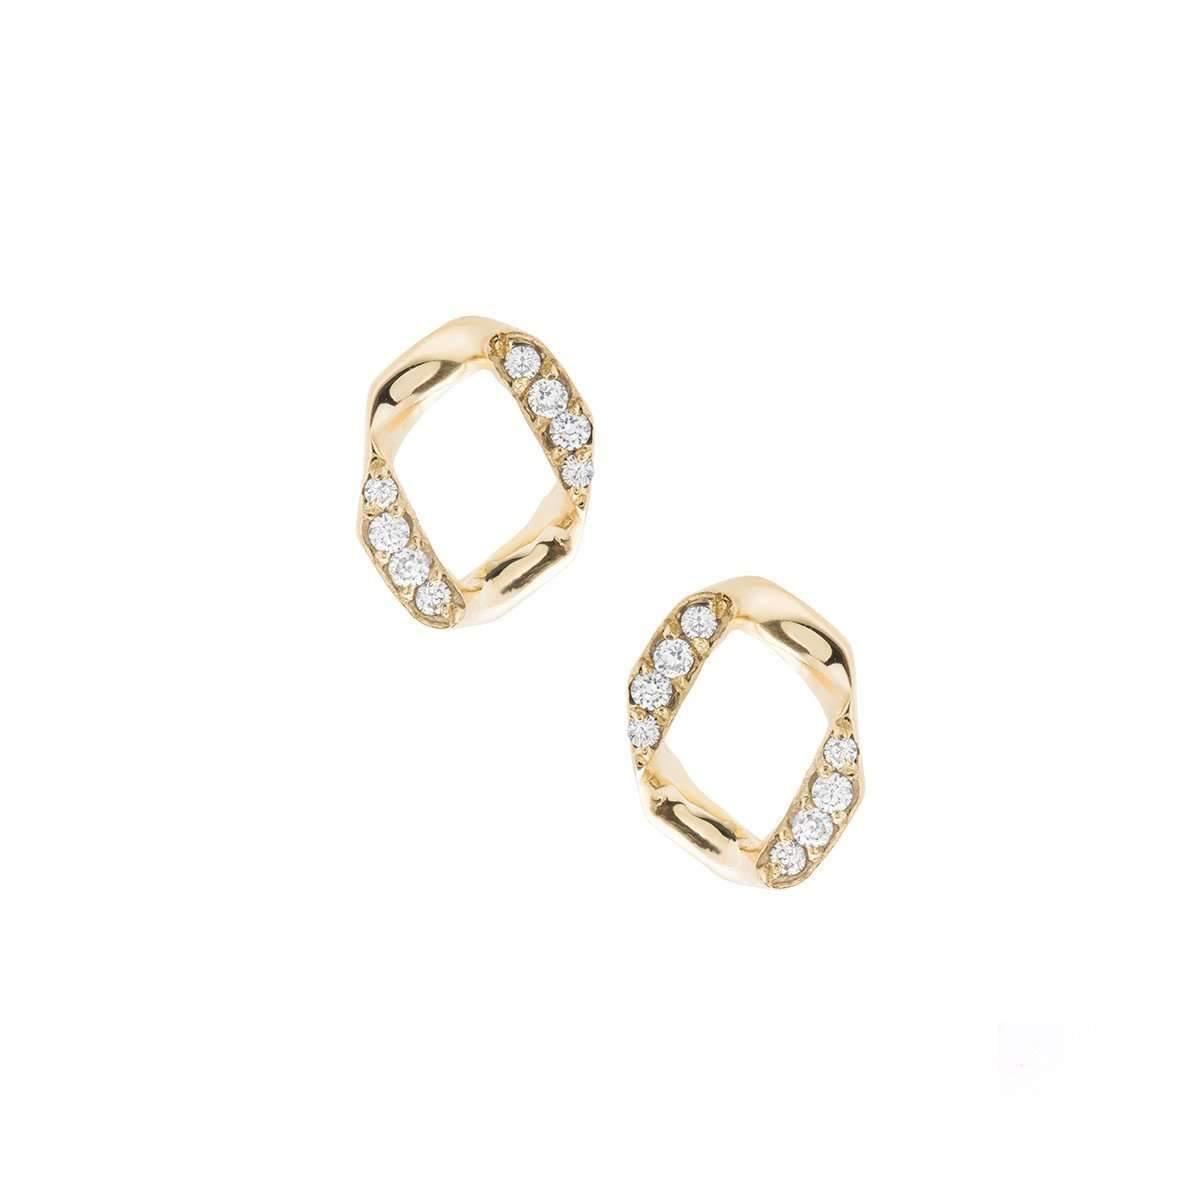 Joanna Laura Constantine Link Pave Stud Earrings JejqwBNi